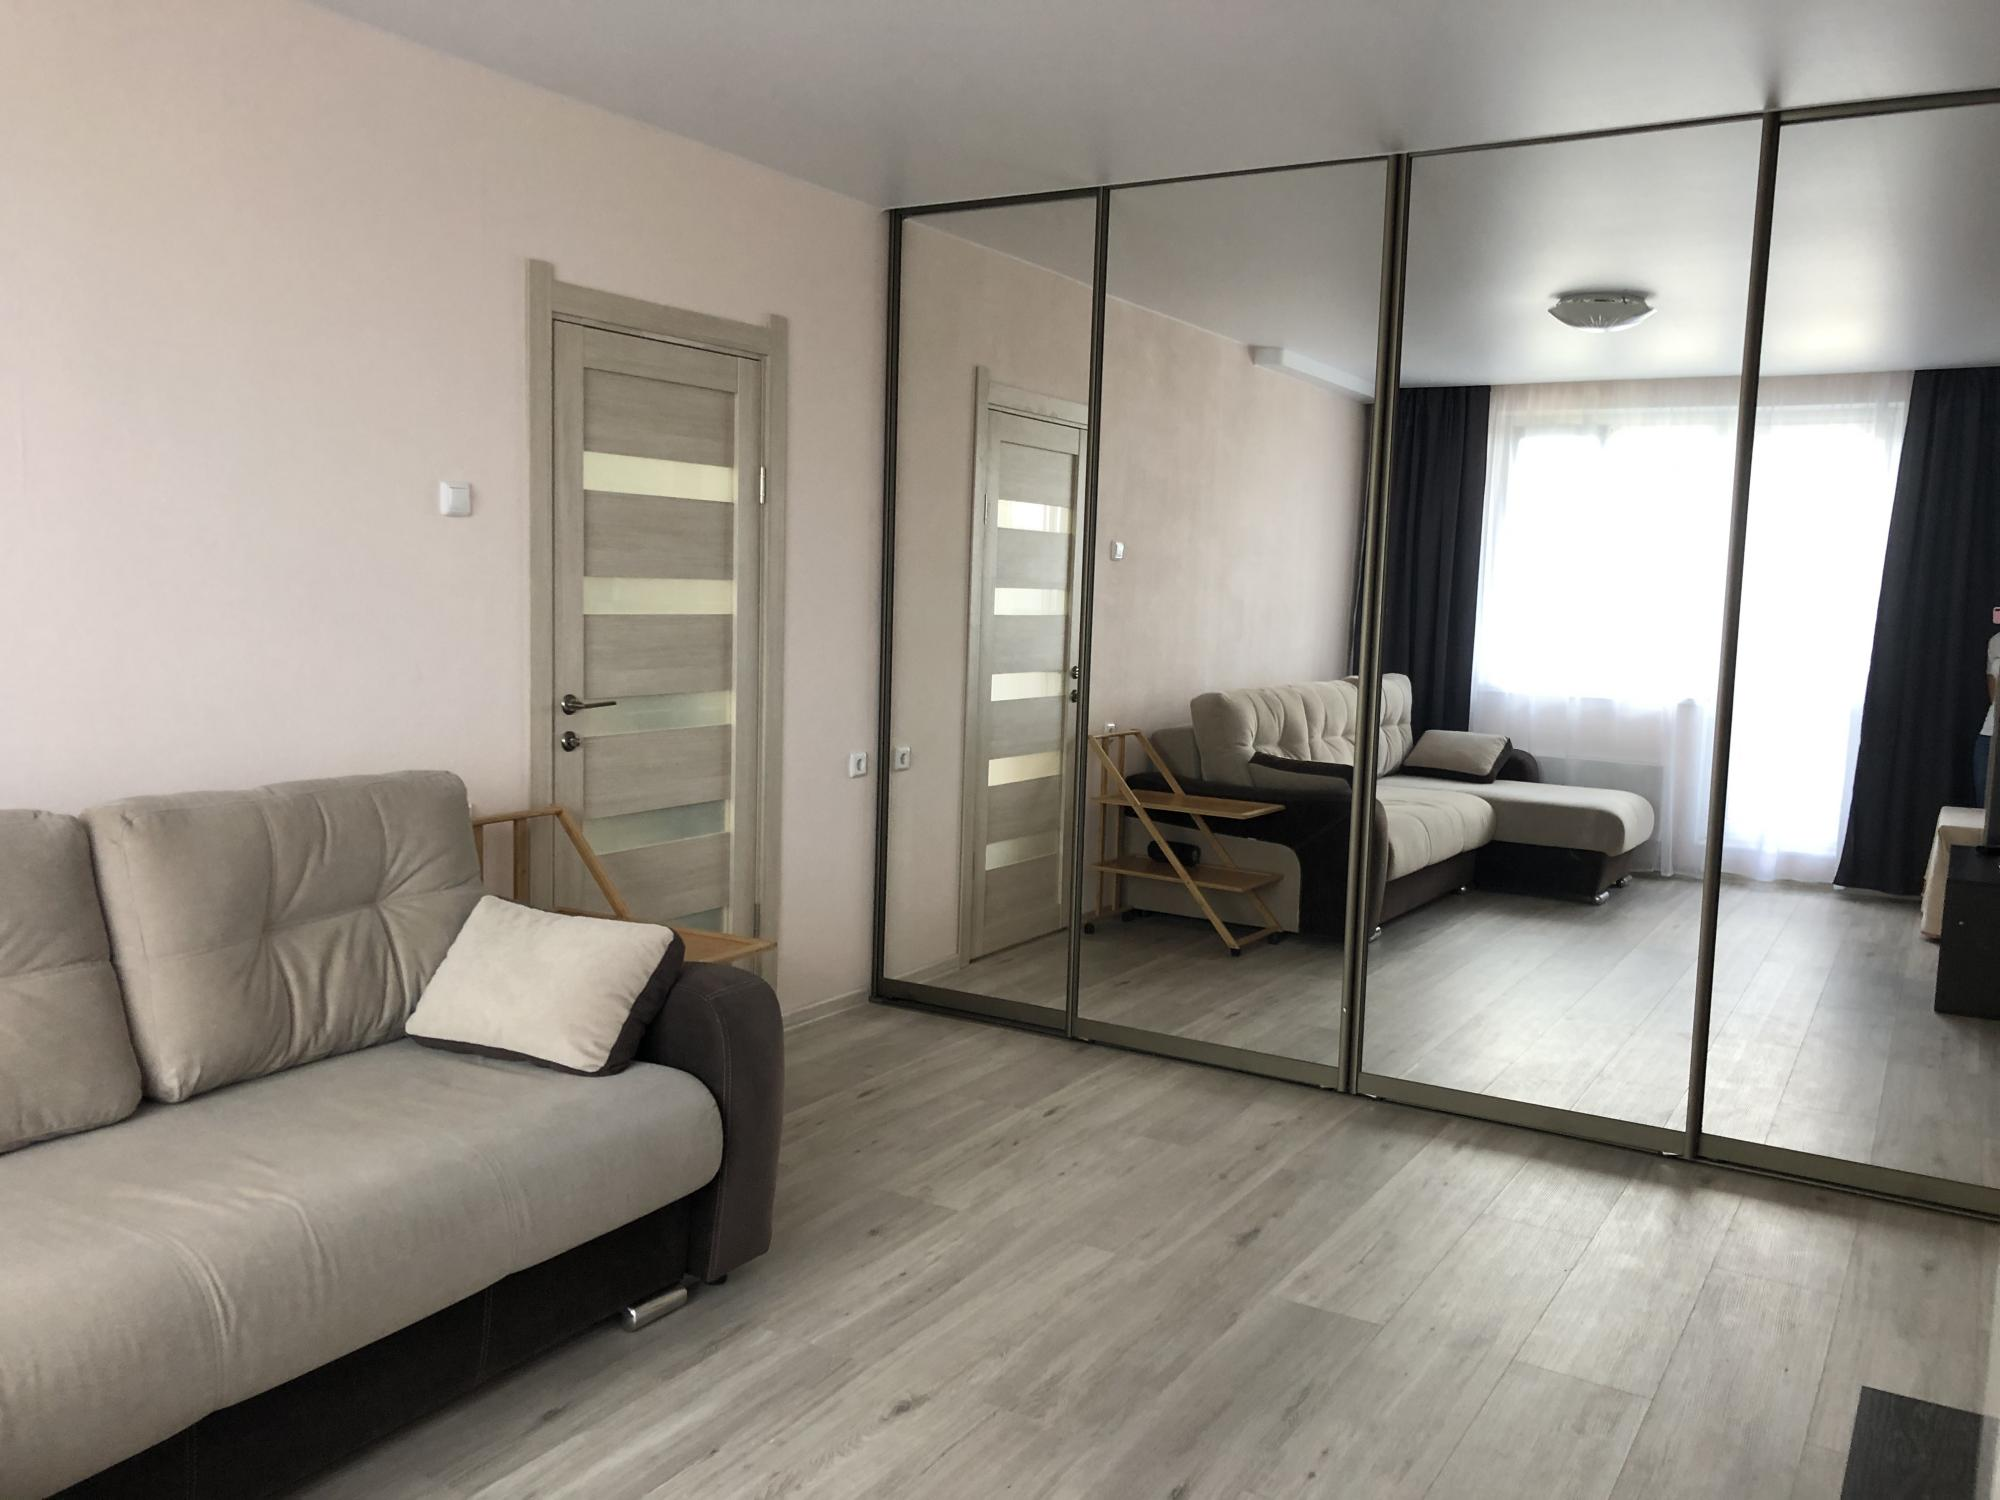 Квартира, 1 комната, 38.5 м² в Юбилейном 89261770666 купить 1